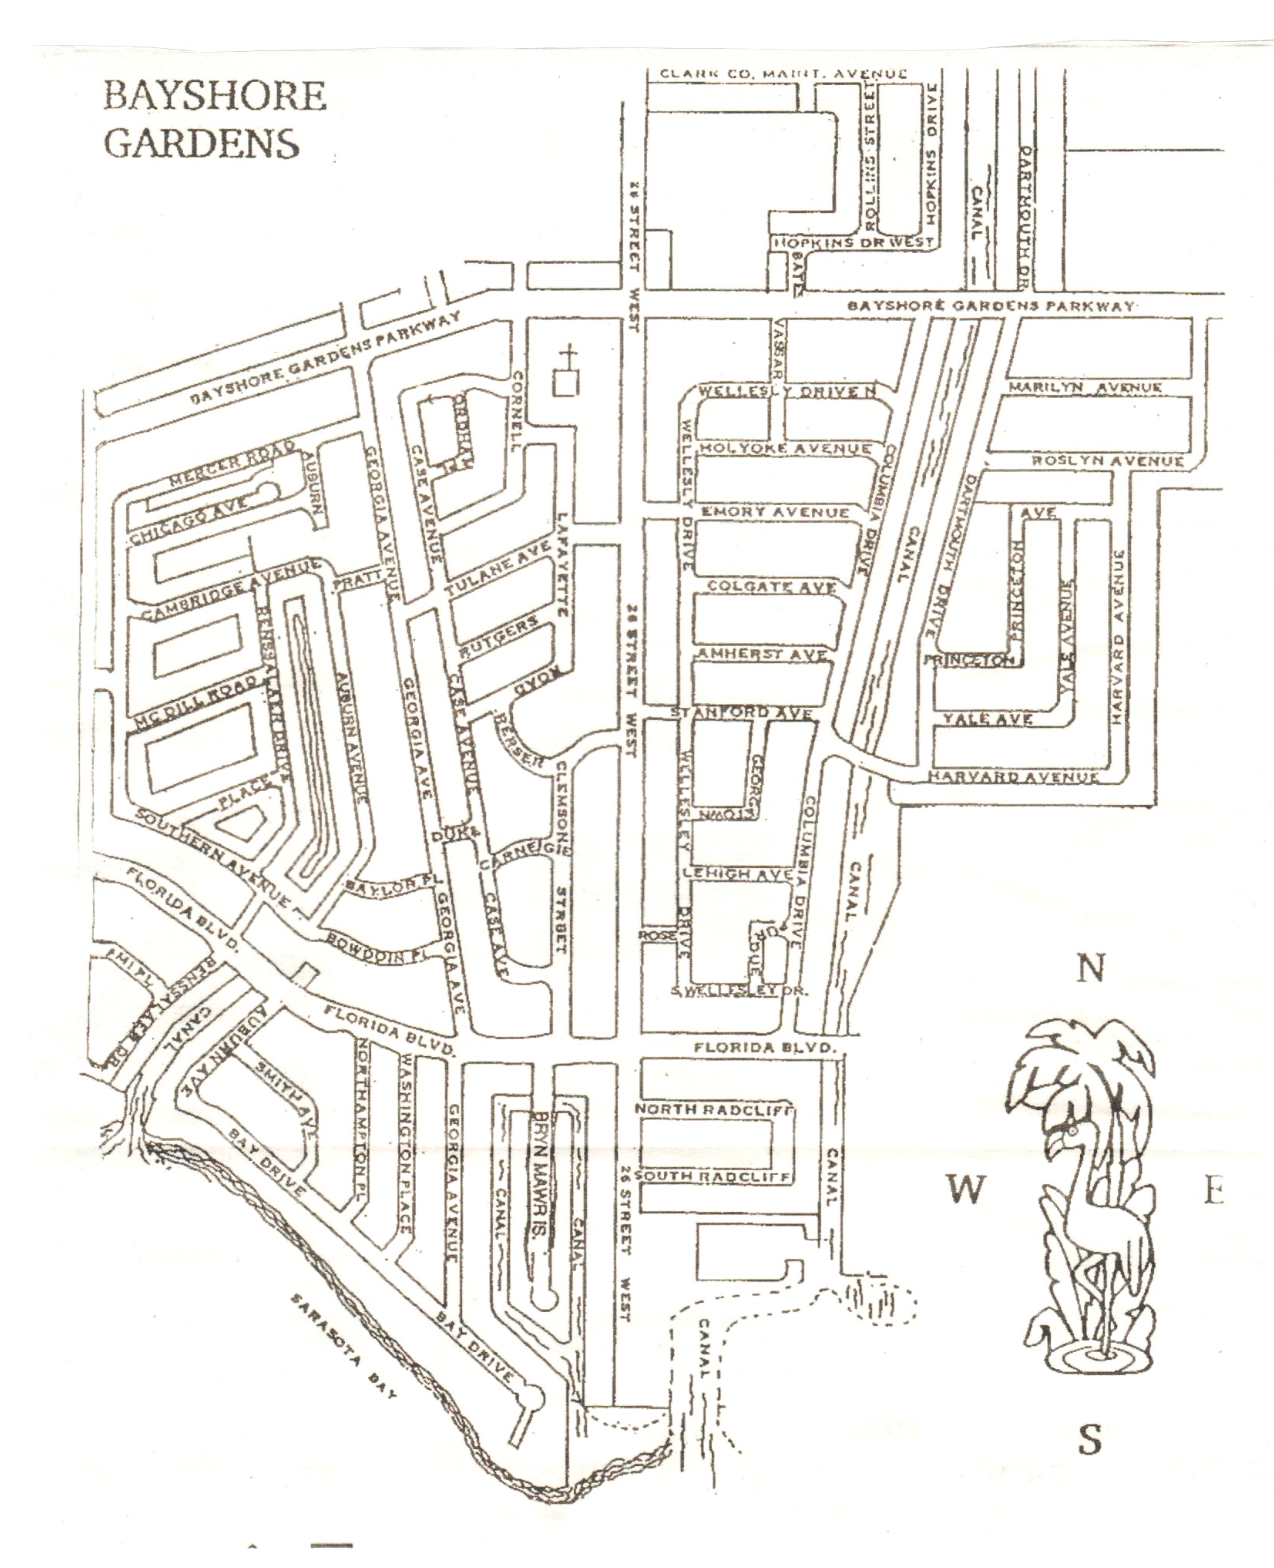 May contain: diagram, plot, and plan